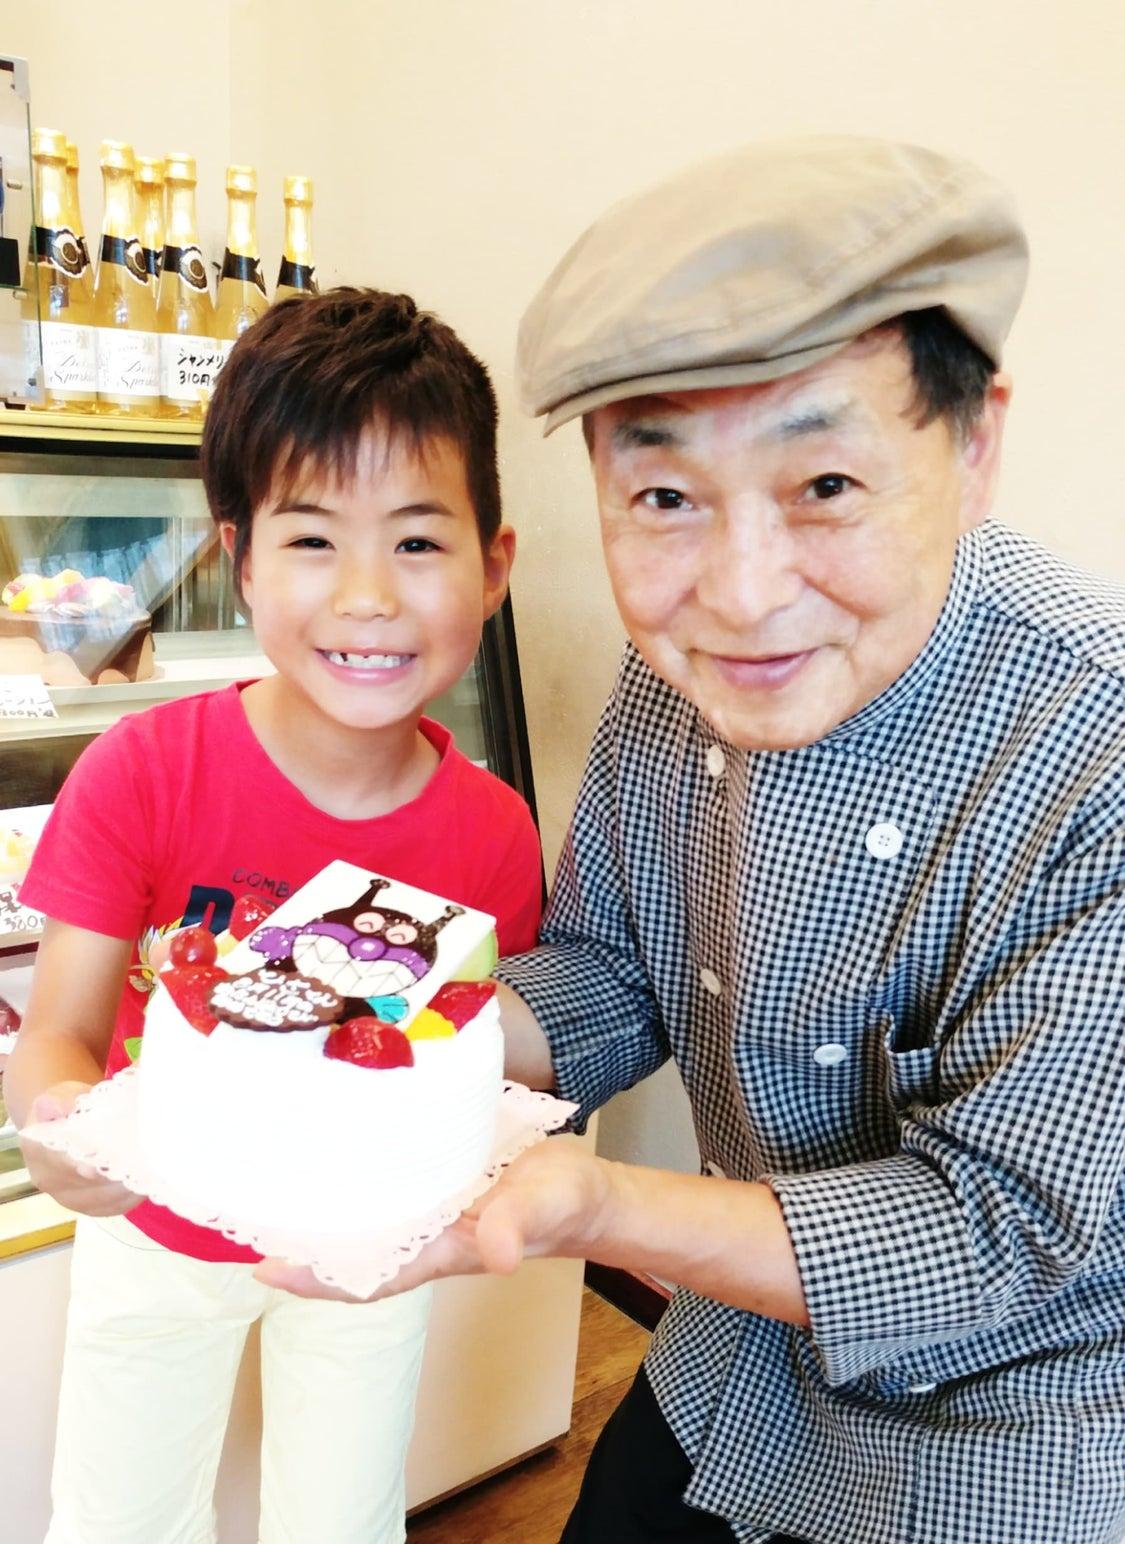 【NEWS】10月バースデーケーキプレゼント企画 ★9/1募集開始スタートの記事より